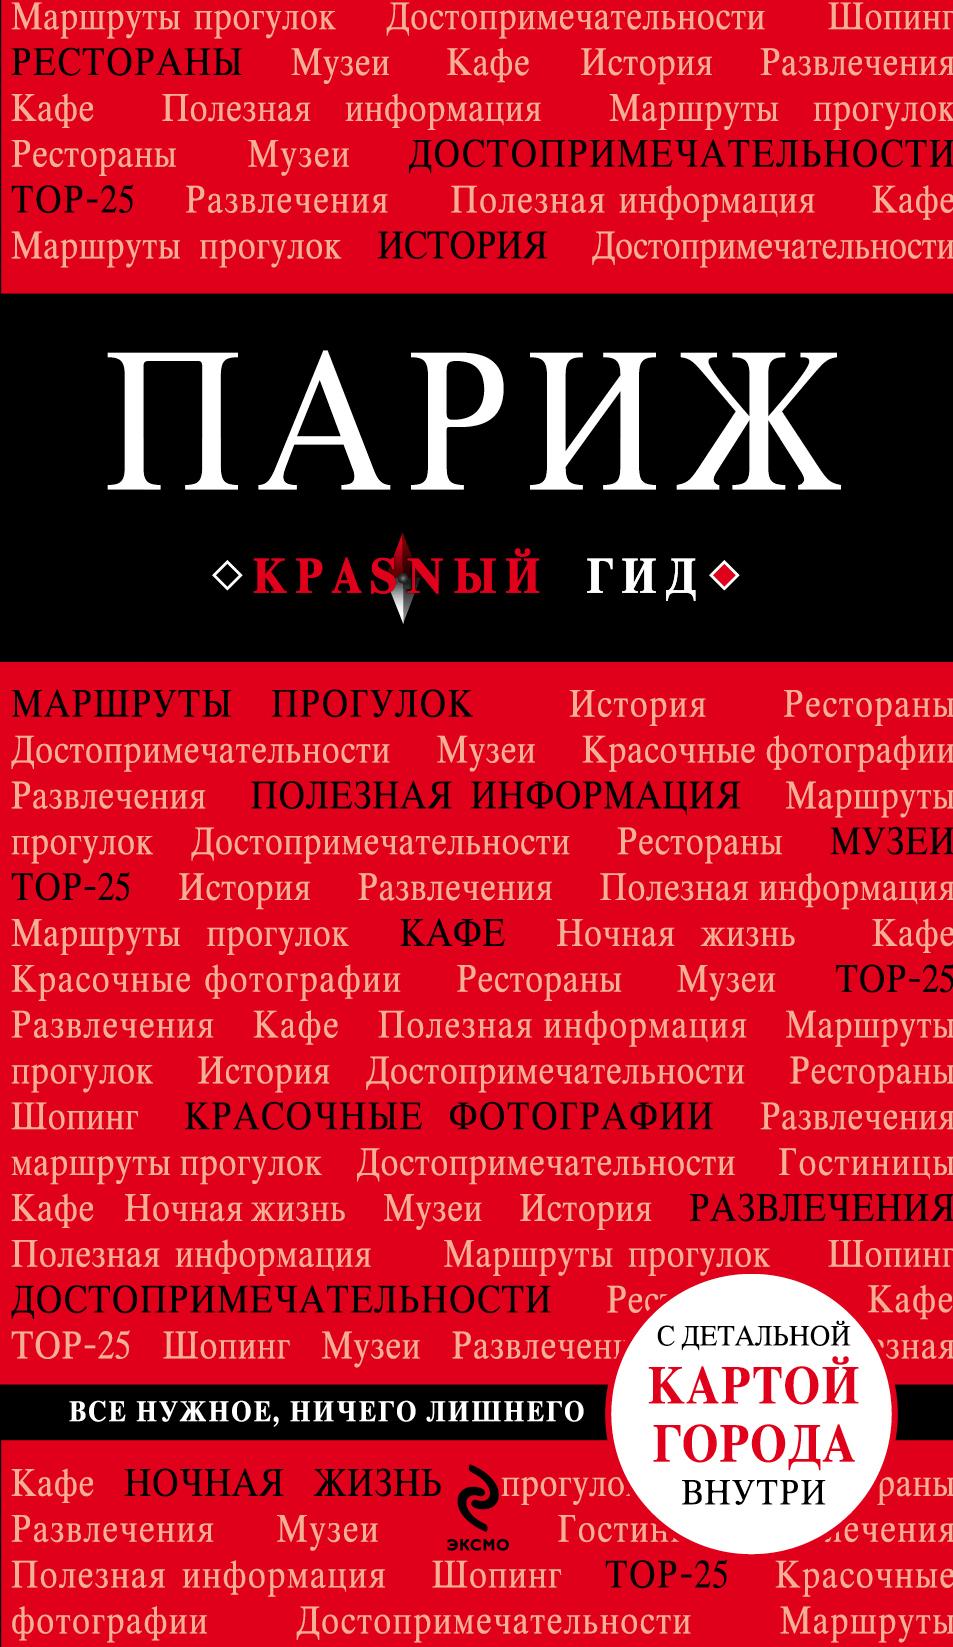 Лебедева И.А. Париж. 4-е изд., испр. и доп.